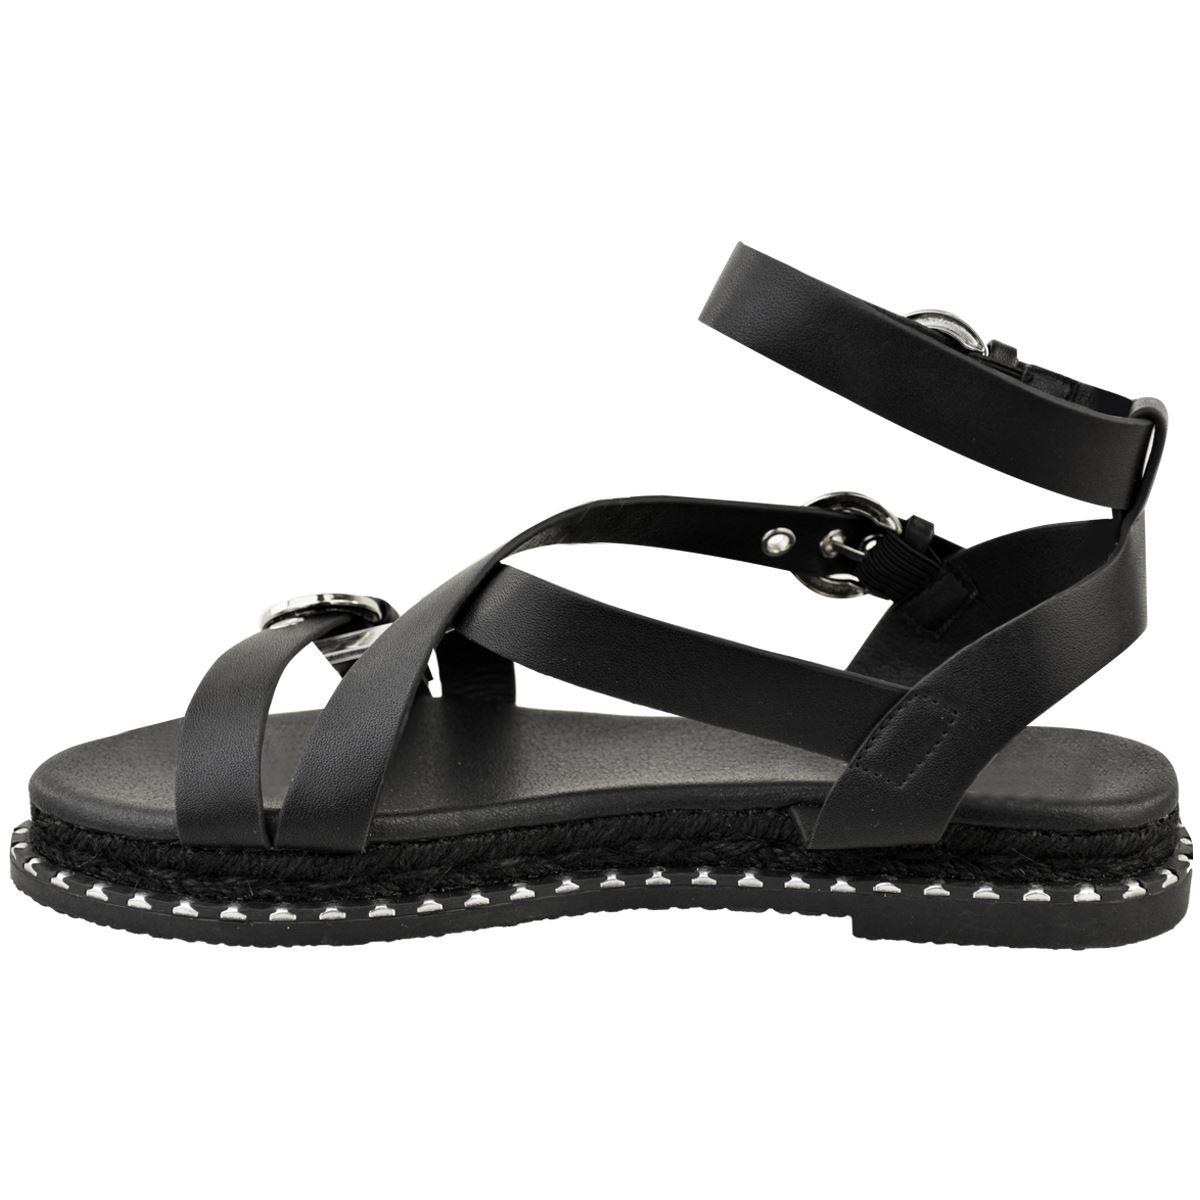 Womens Ladies Flat Black Faux Leather Espadrille Sandals Platform Strappy Summer